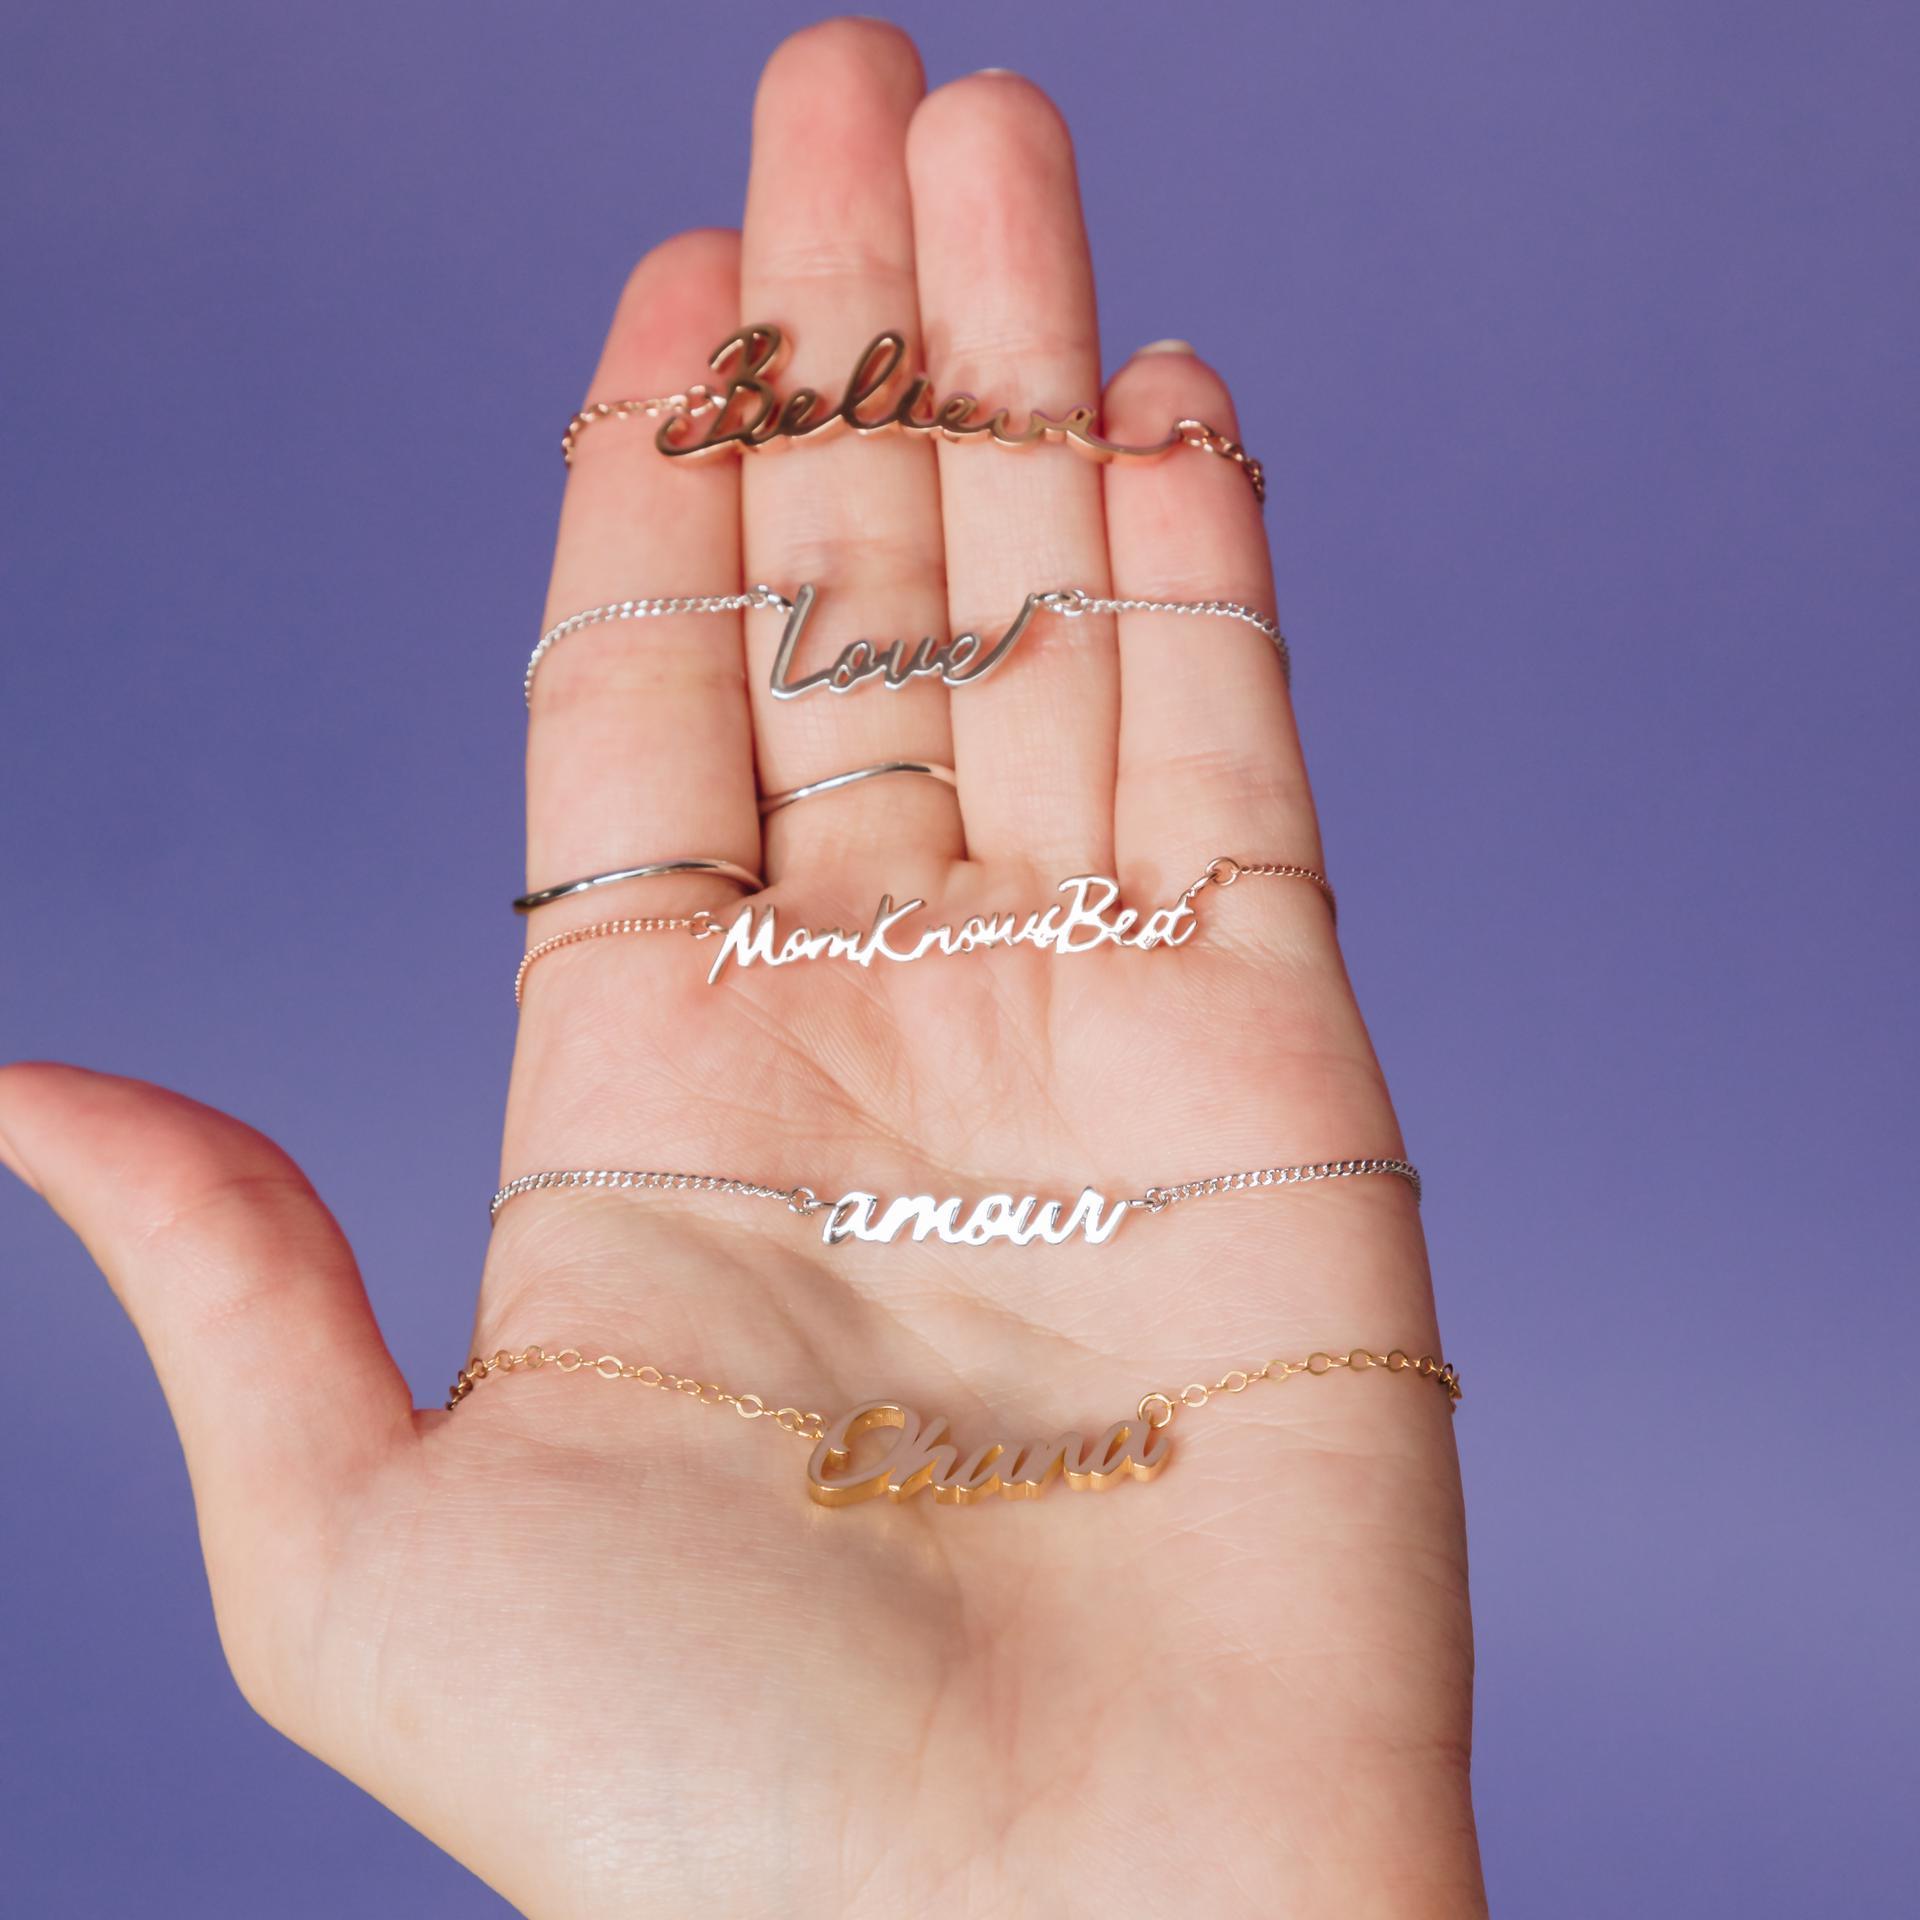 @mychicadventure honors her grandmother on a Capsul bracelet